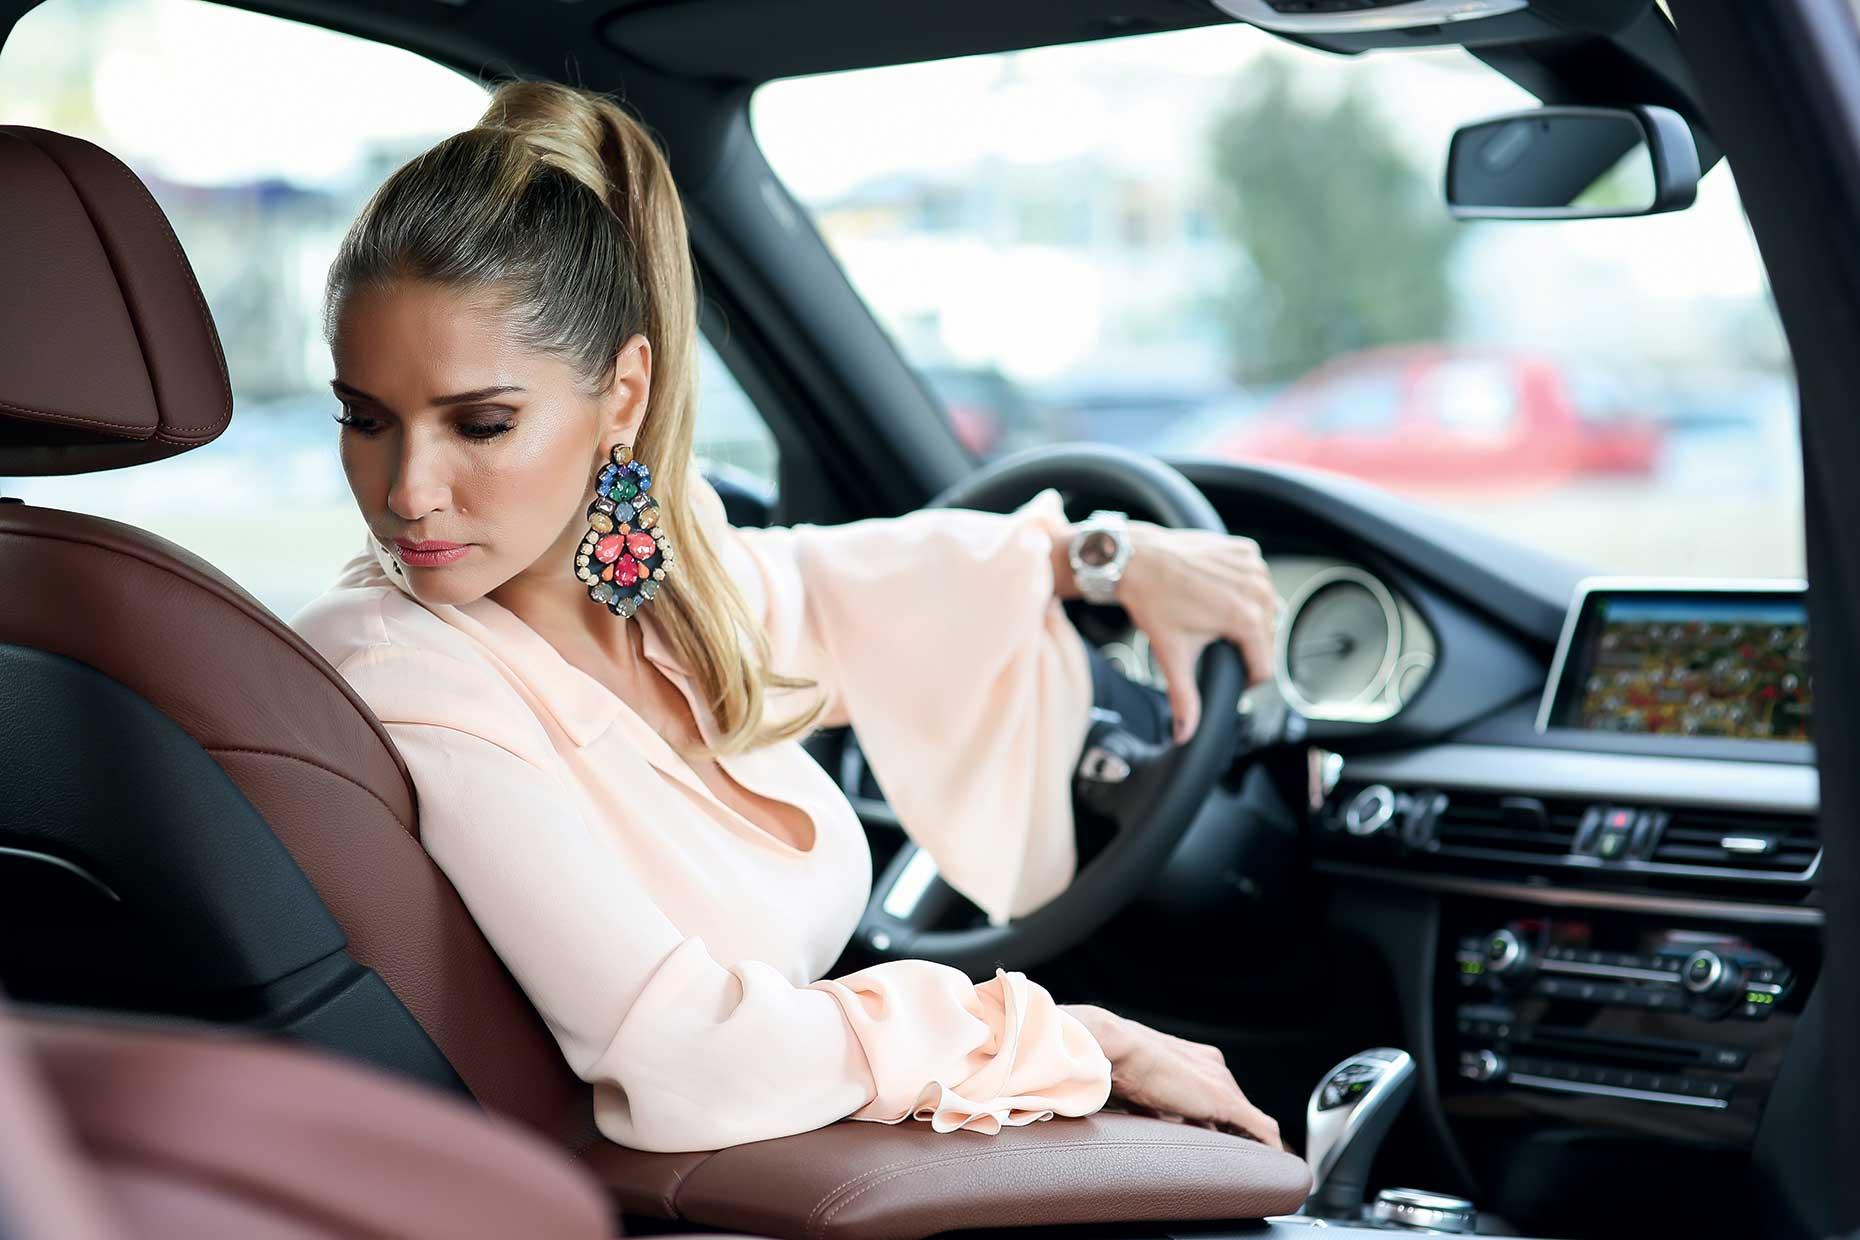 Ileana Badiu Amp Bmw X5 Perfect Match Gentleman S Car